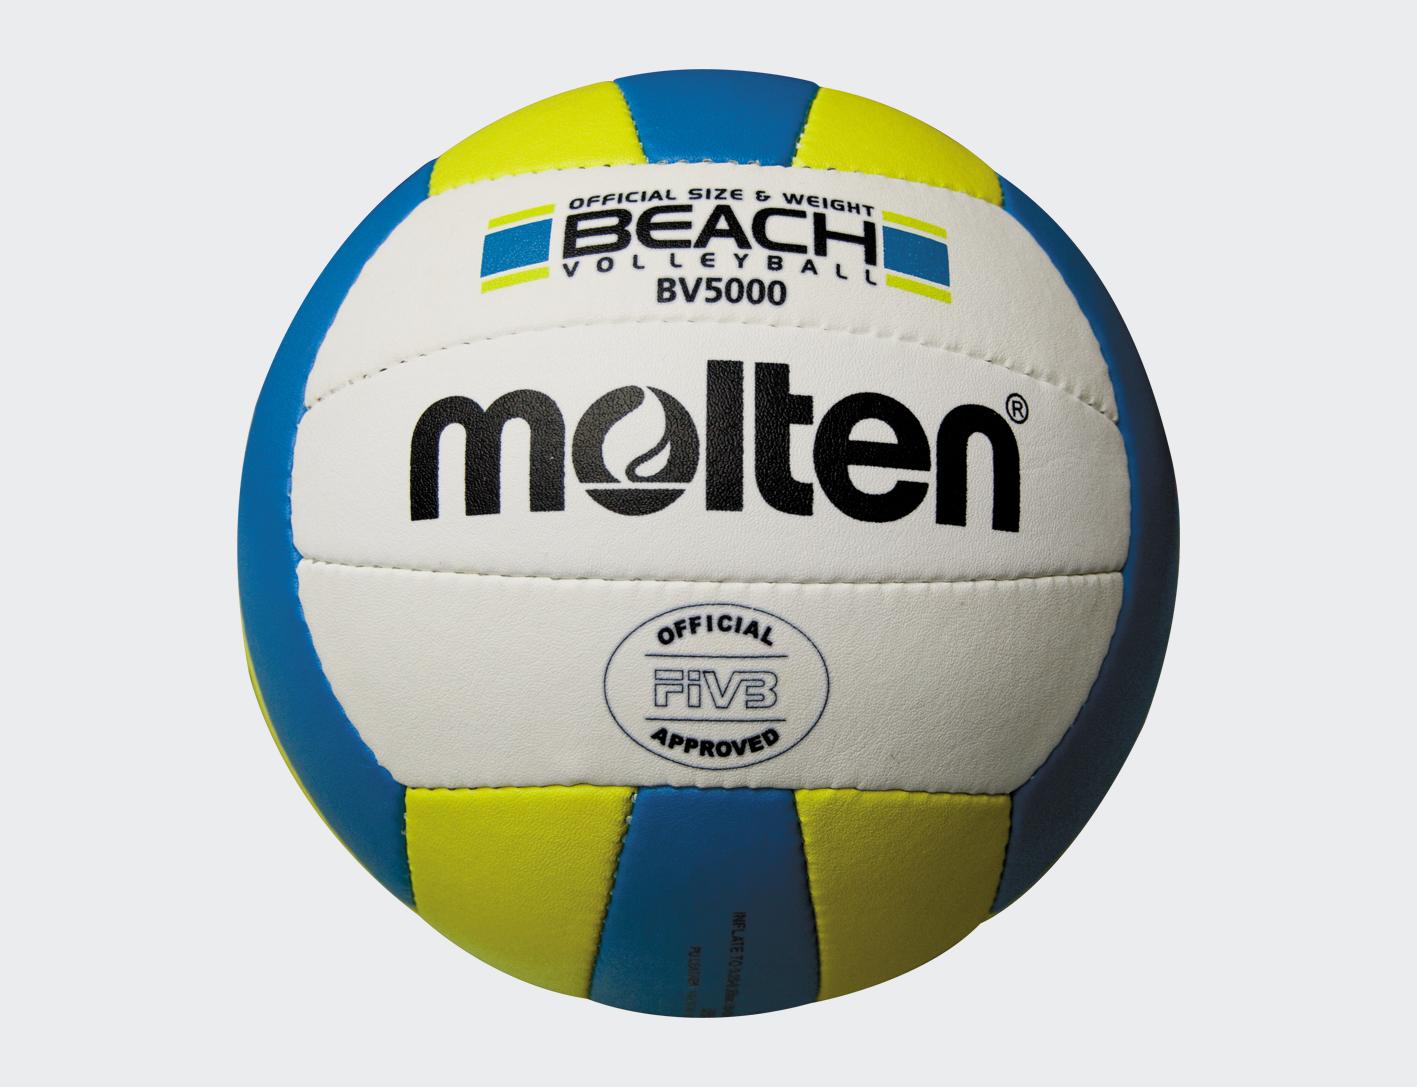 BV5000 Beach Volleyball-0